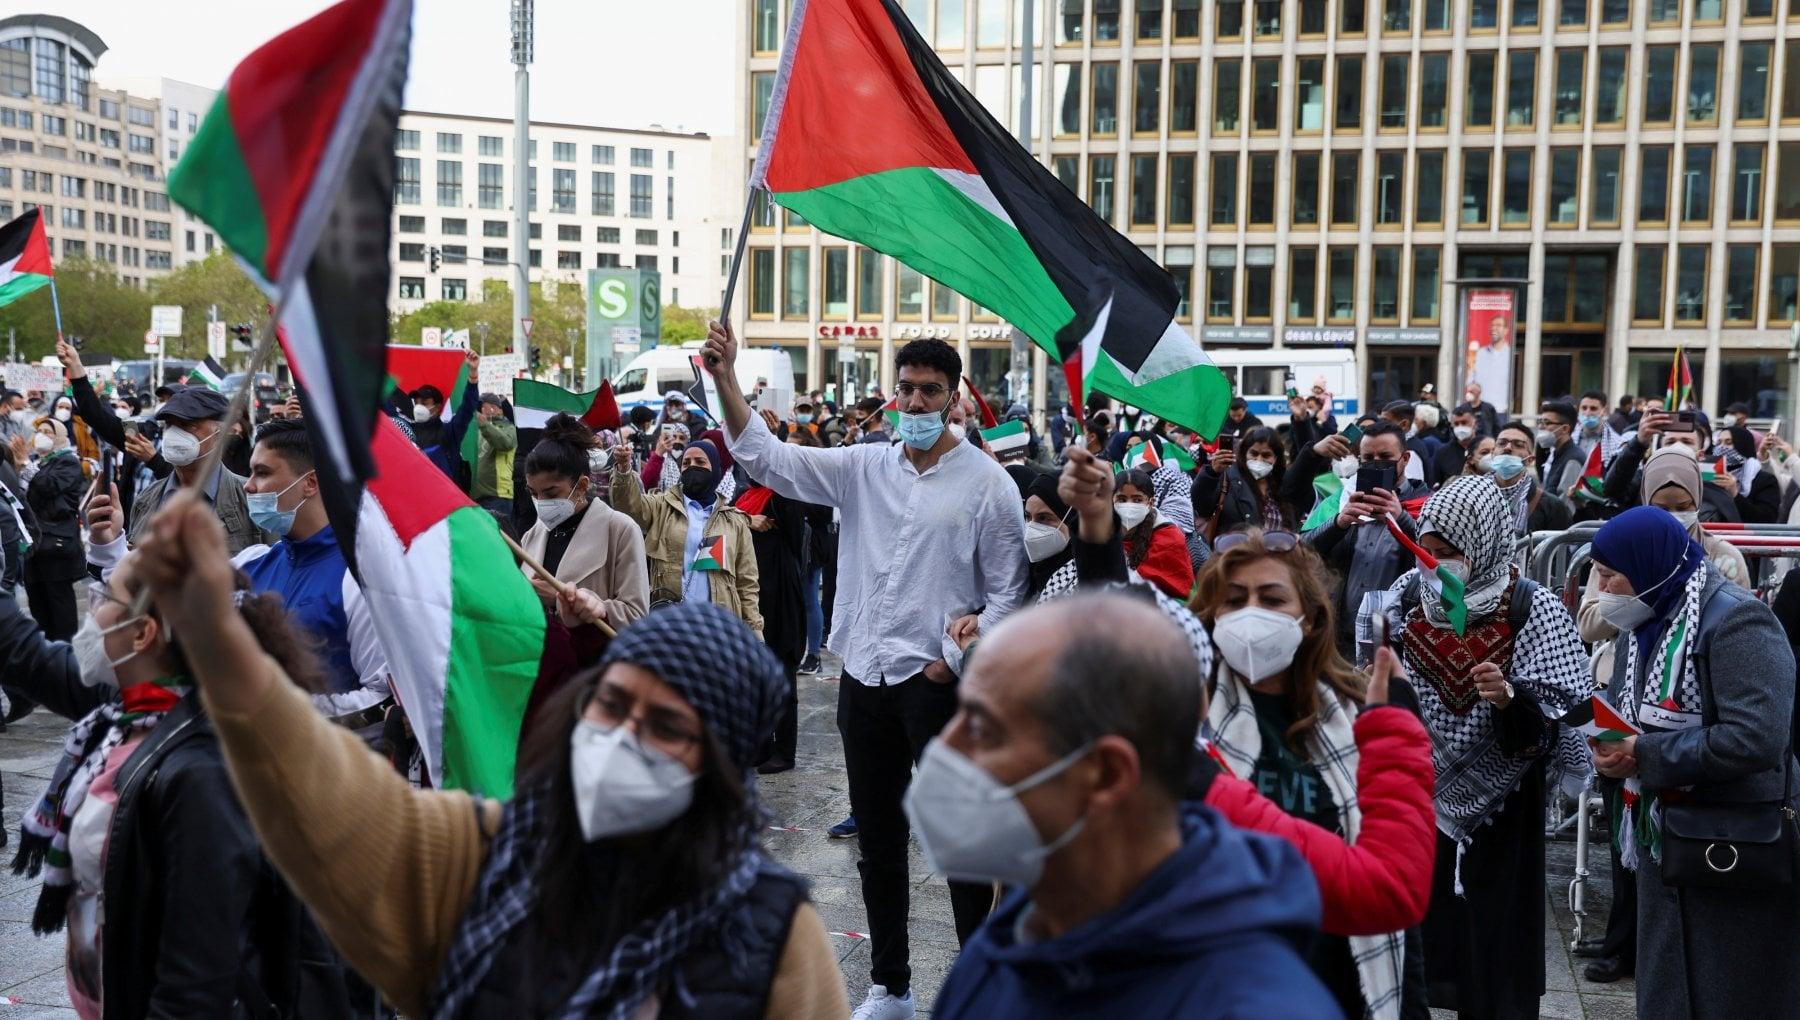 "182702736 97072956 6dc1 4d35 87a9 58d40669c089 - Germania, Merkel condanna la deriva antisemita dei cortei filo-palestinesi: ""Punire i responsabili"""